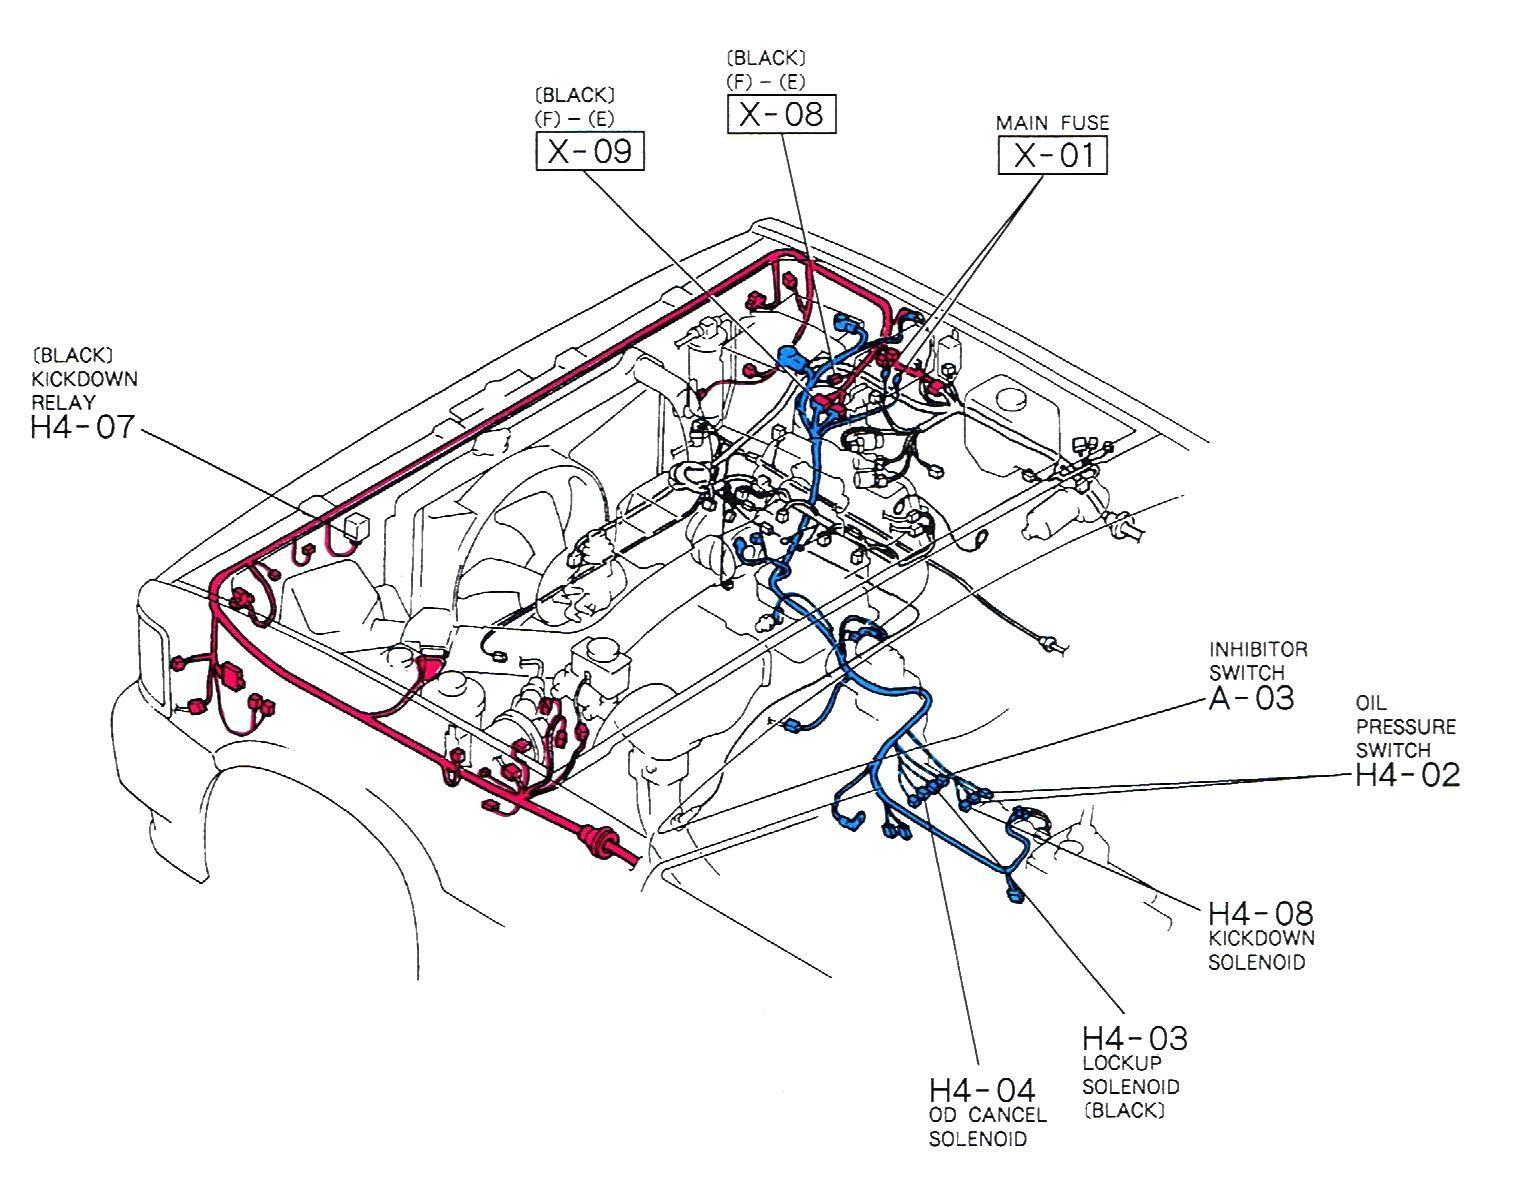 Wiring Diagram For 1000w Hps Ballast